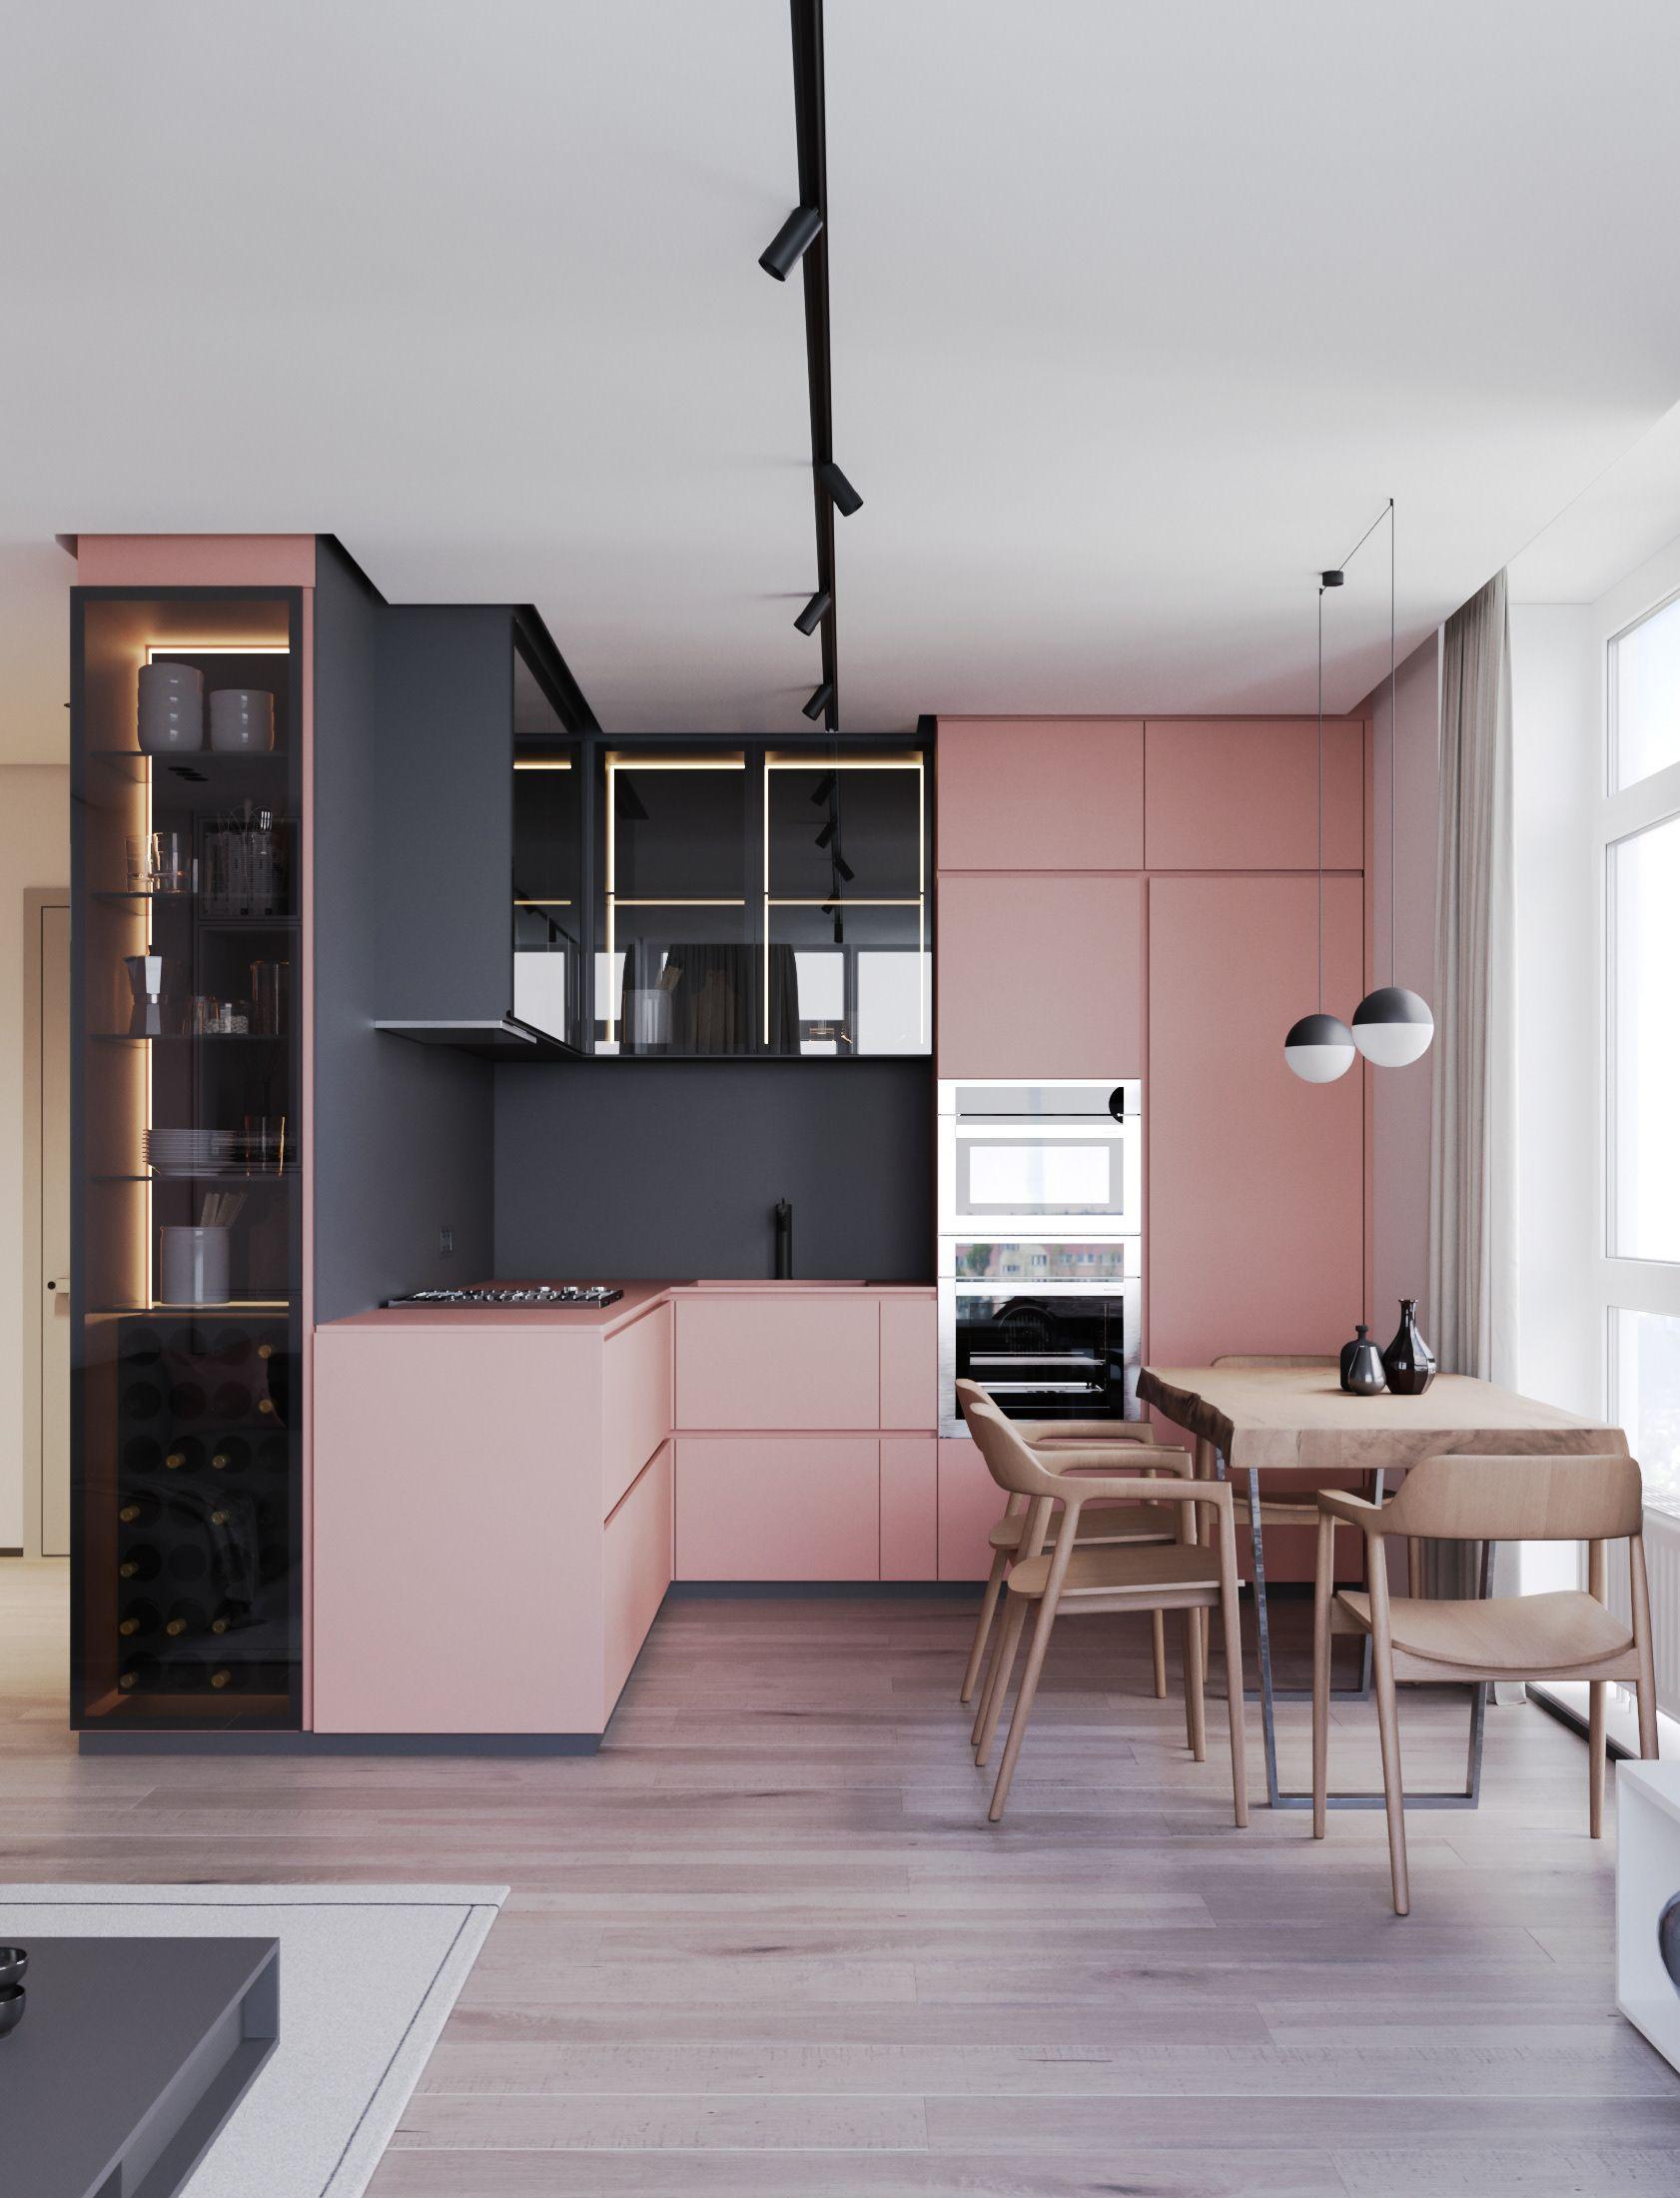 kitchen design pics luxury И матовость french quarter interior design inspiration modern quarter on behance ideal in 2018 pinterest